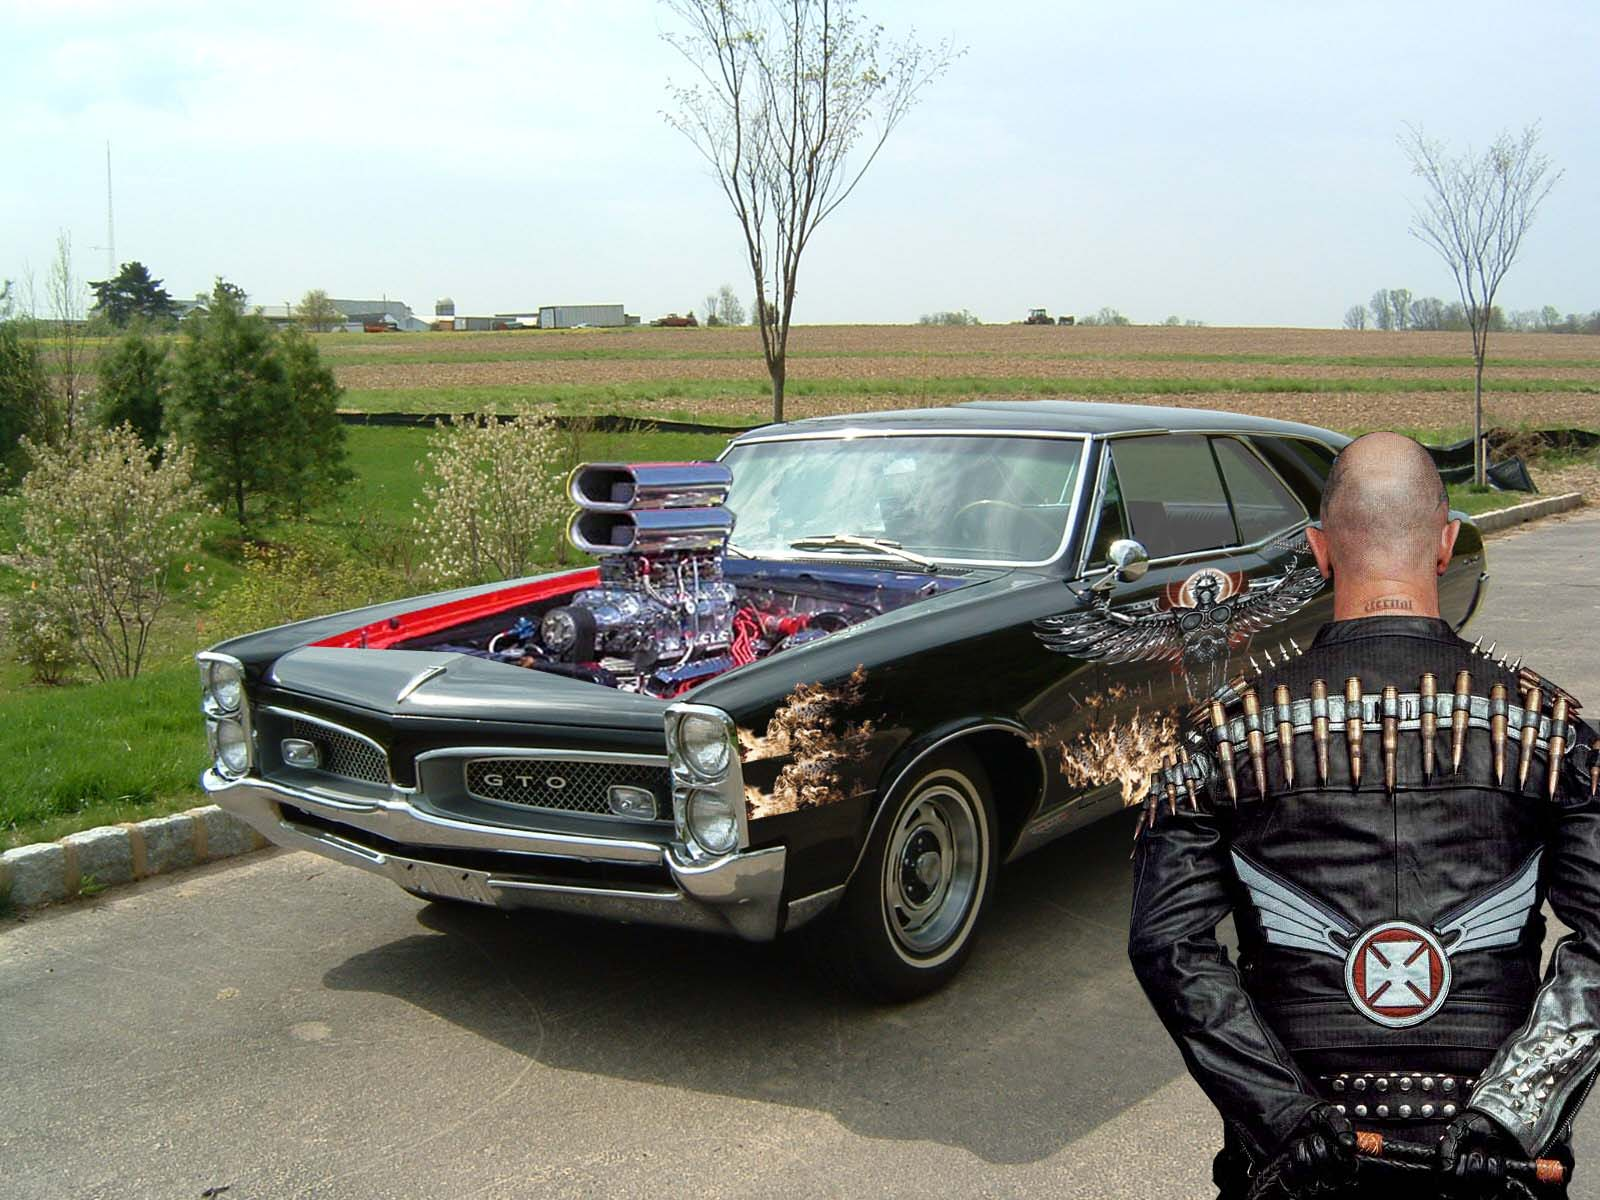 JUDAS PRIEST Heavy Metal Hot Rod Rods Muscle Pontiac Gto